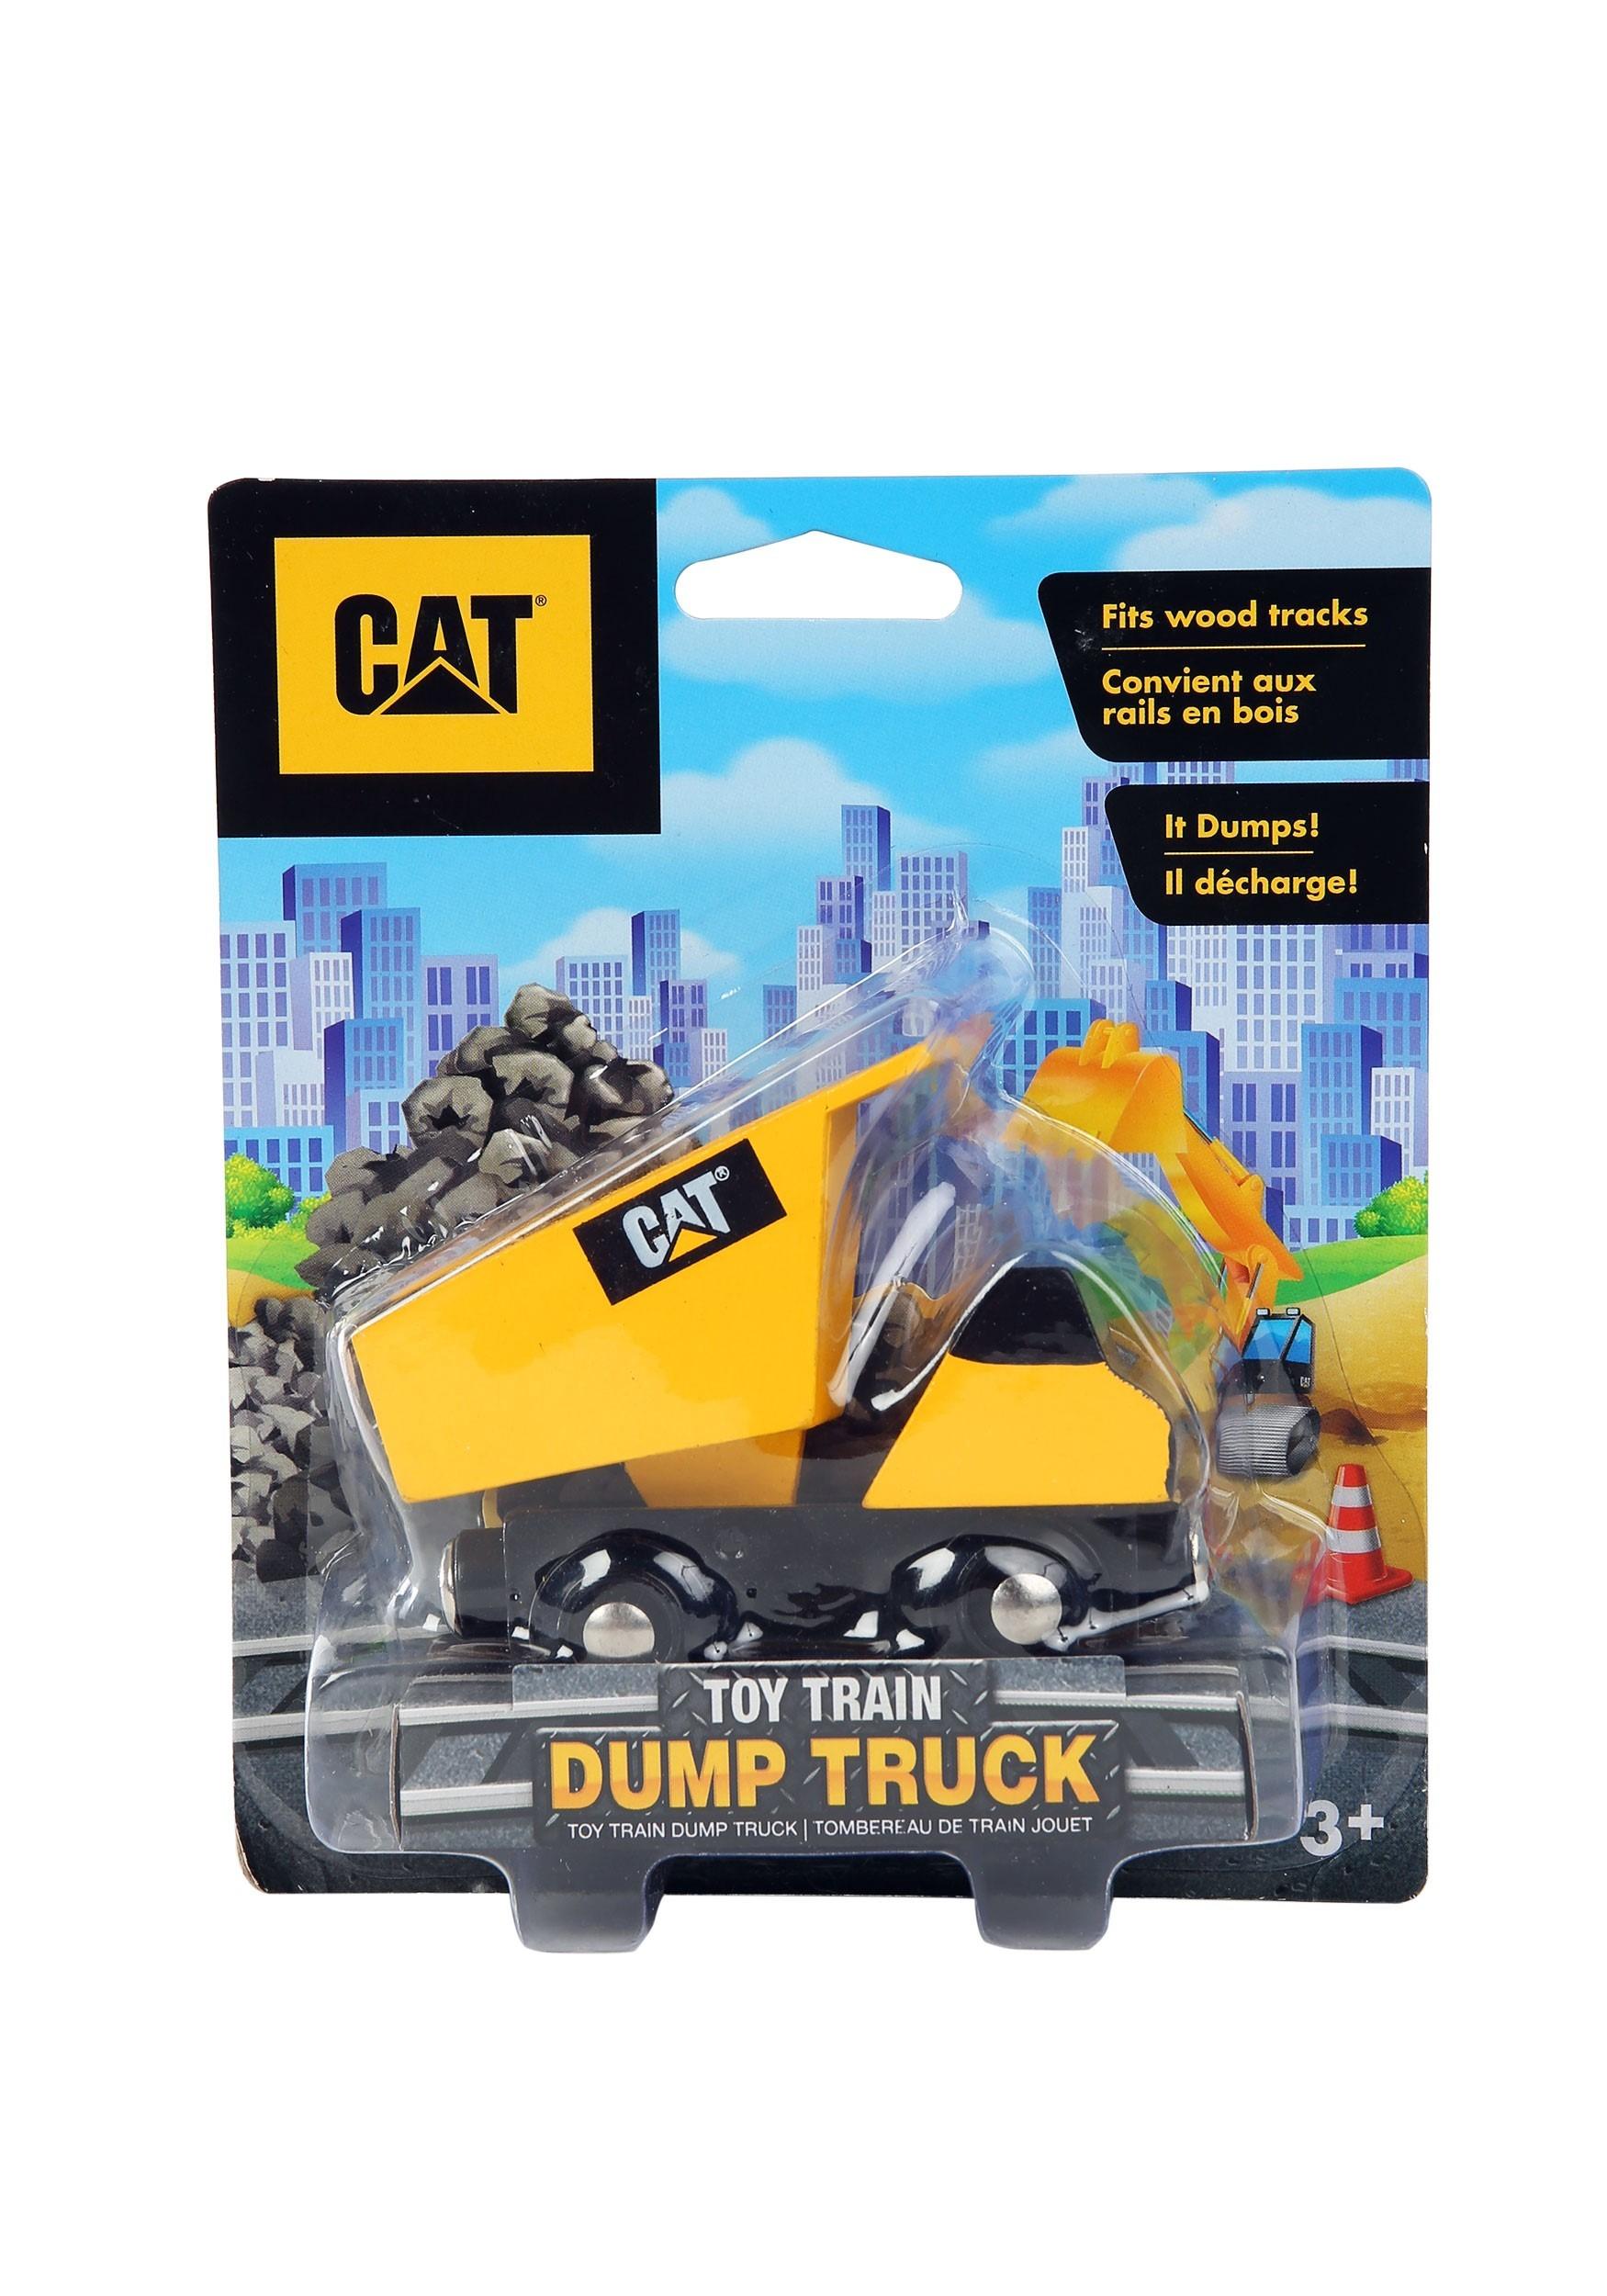 Caterpillar Toy Dump Truck Train